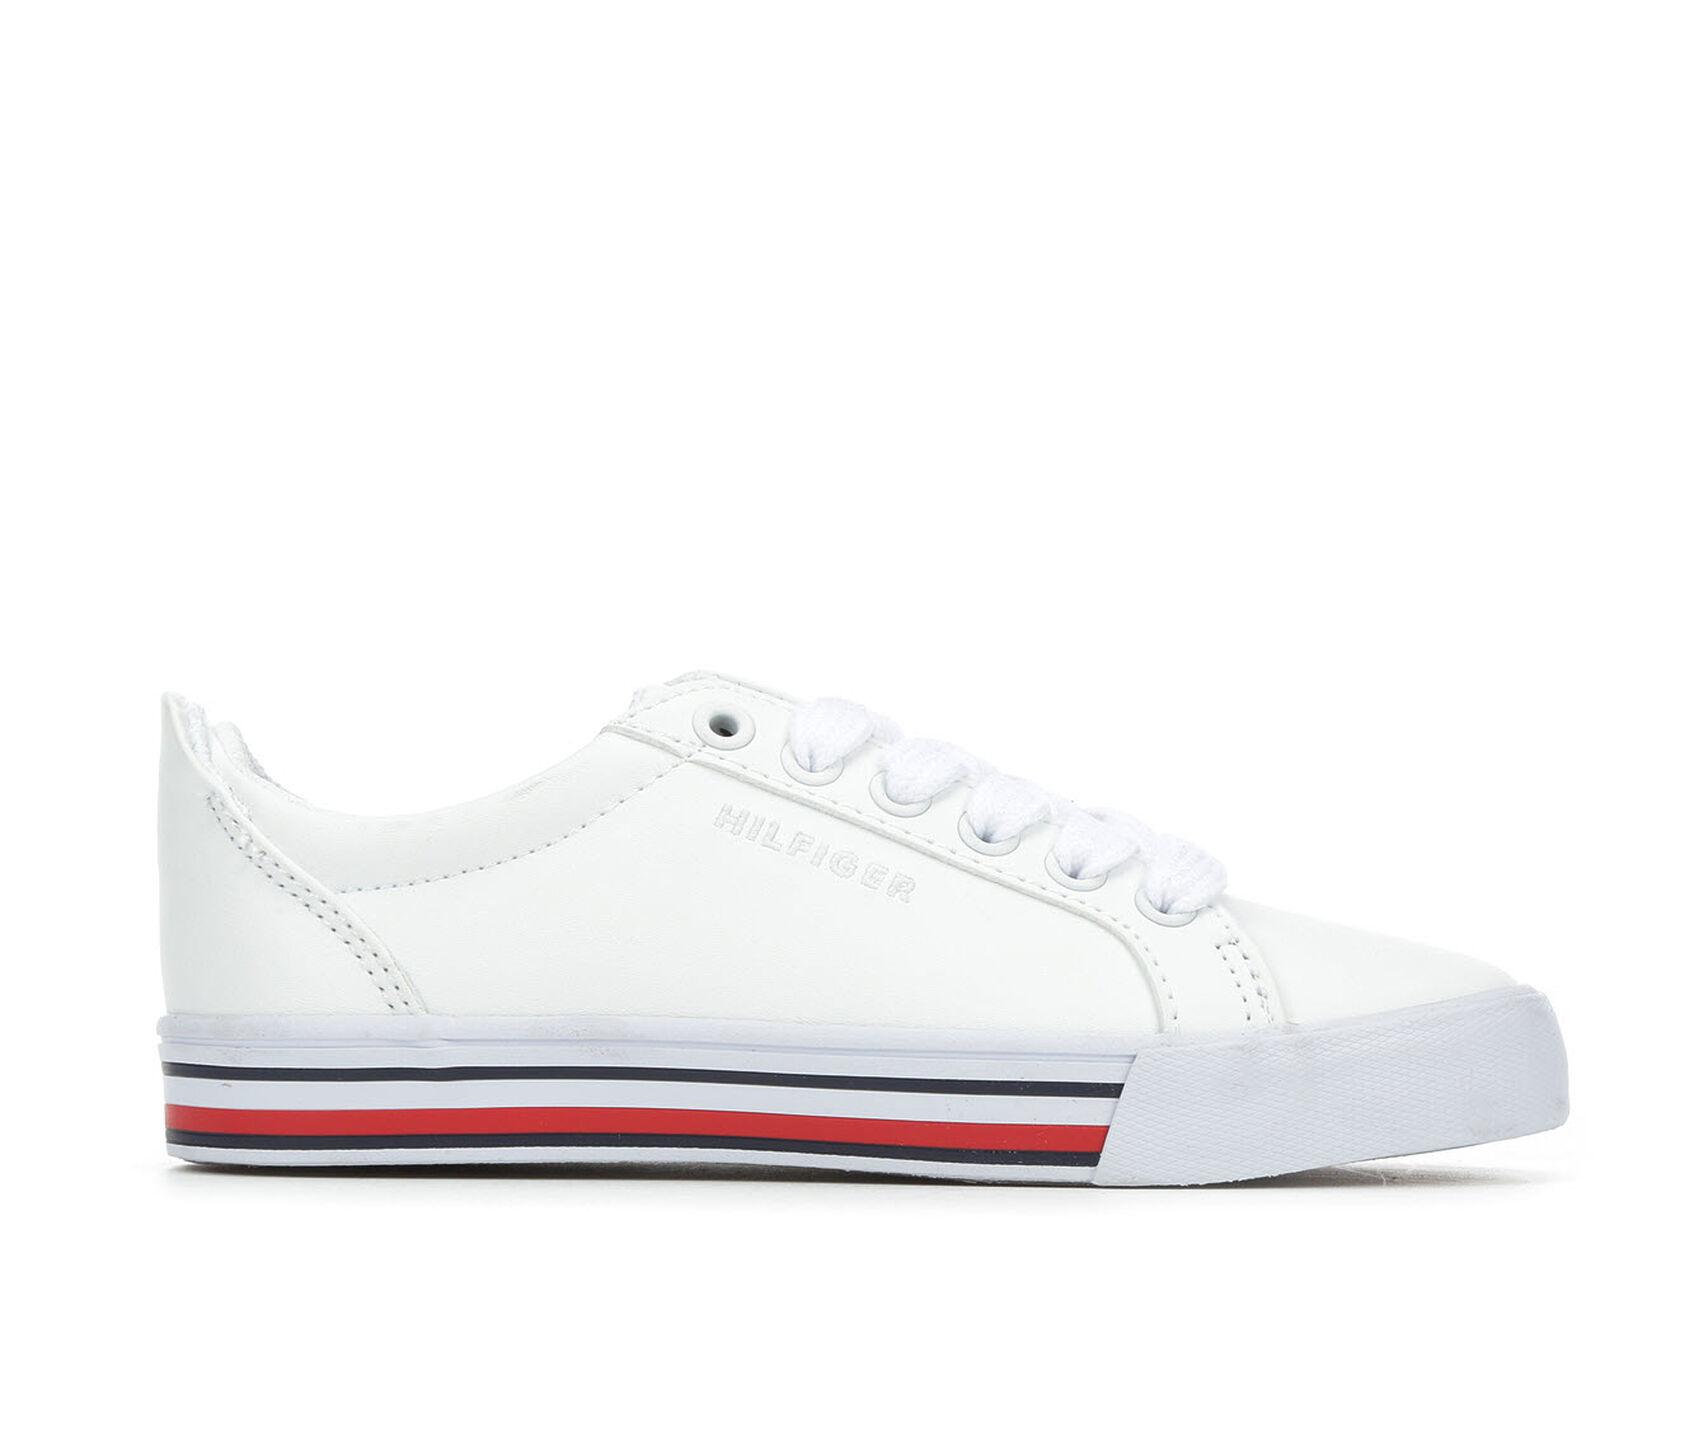 6e7a7be0b446d Boys' Tommy Hilfiger Little Kid & Big Kid Heritage Shoes